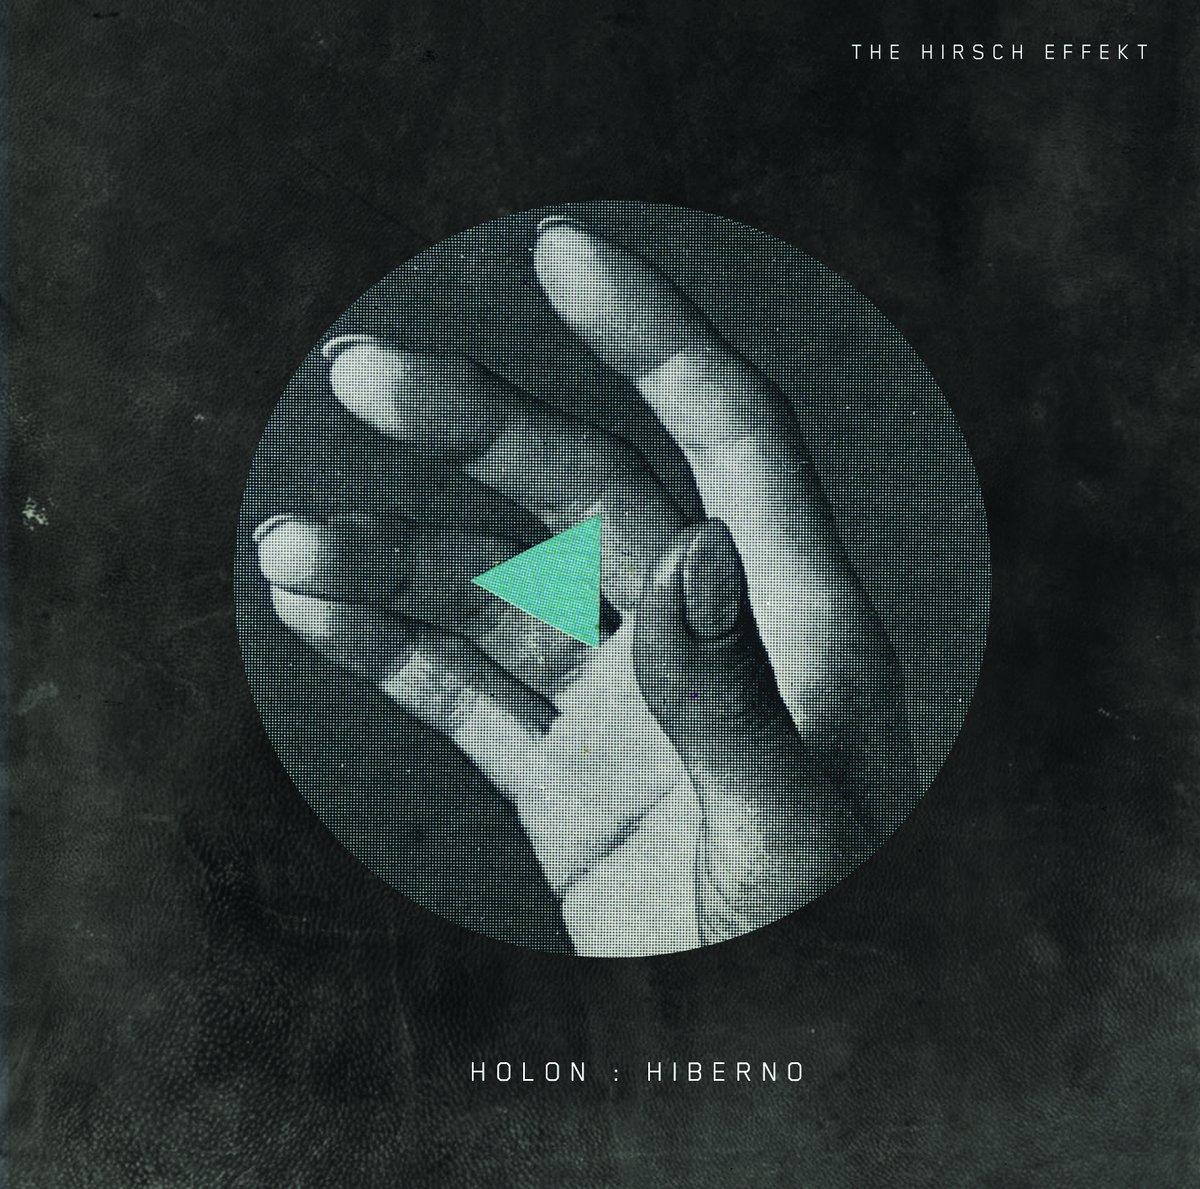 HOLON : HIBERNO LP